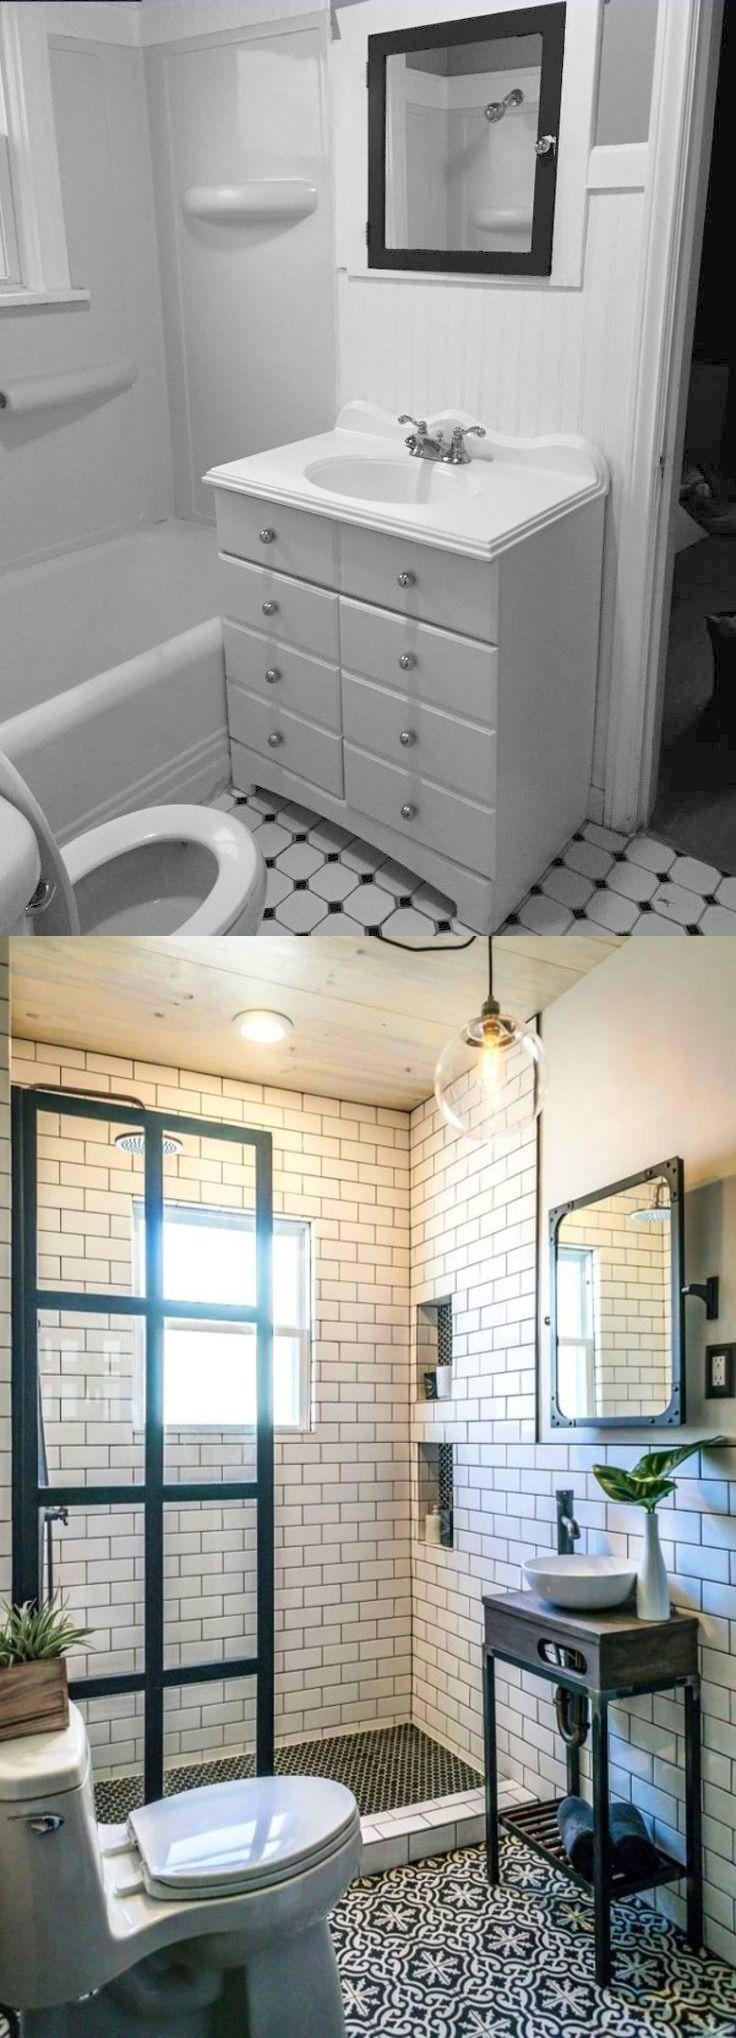 47 Best Ideas About Bathroom Renovation On Pinterest